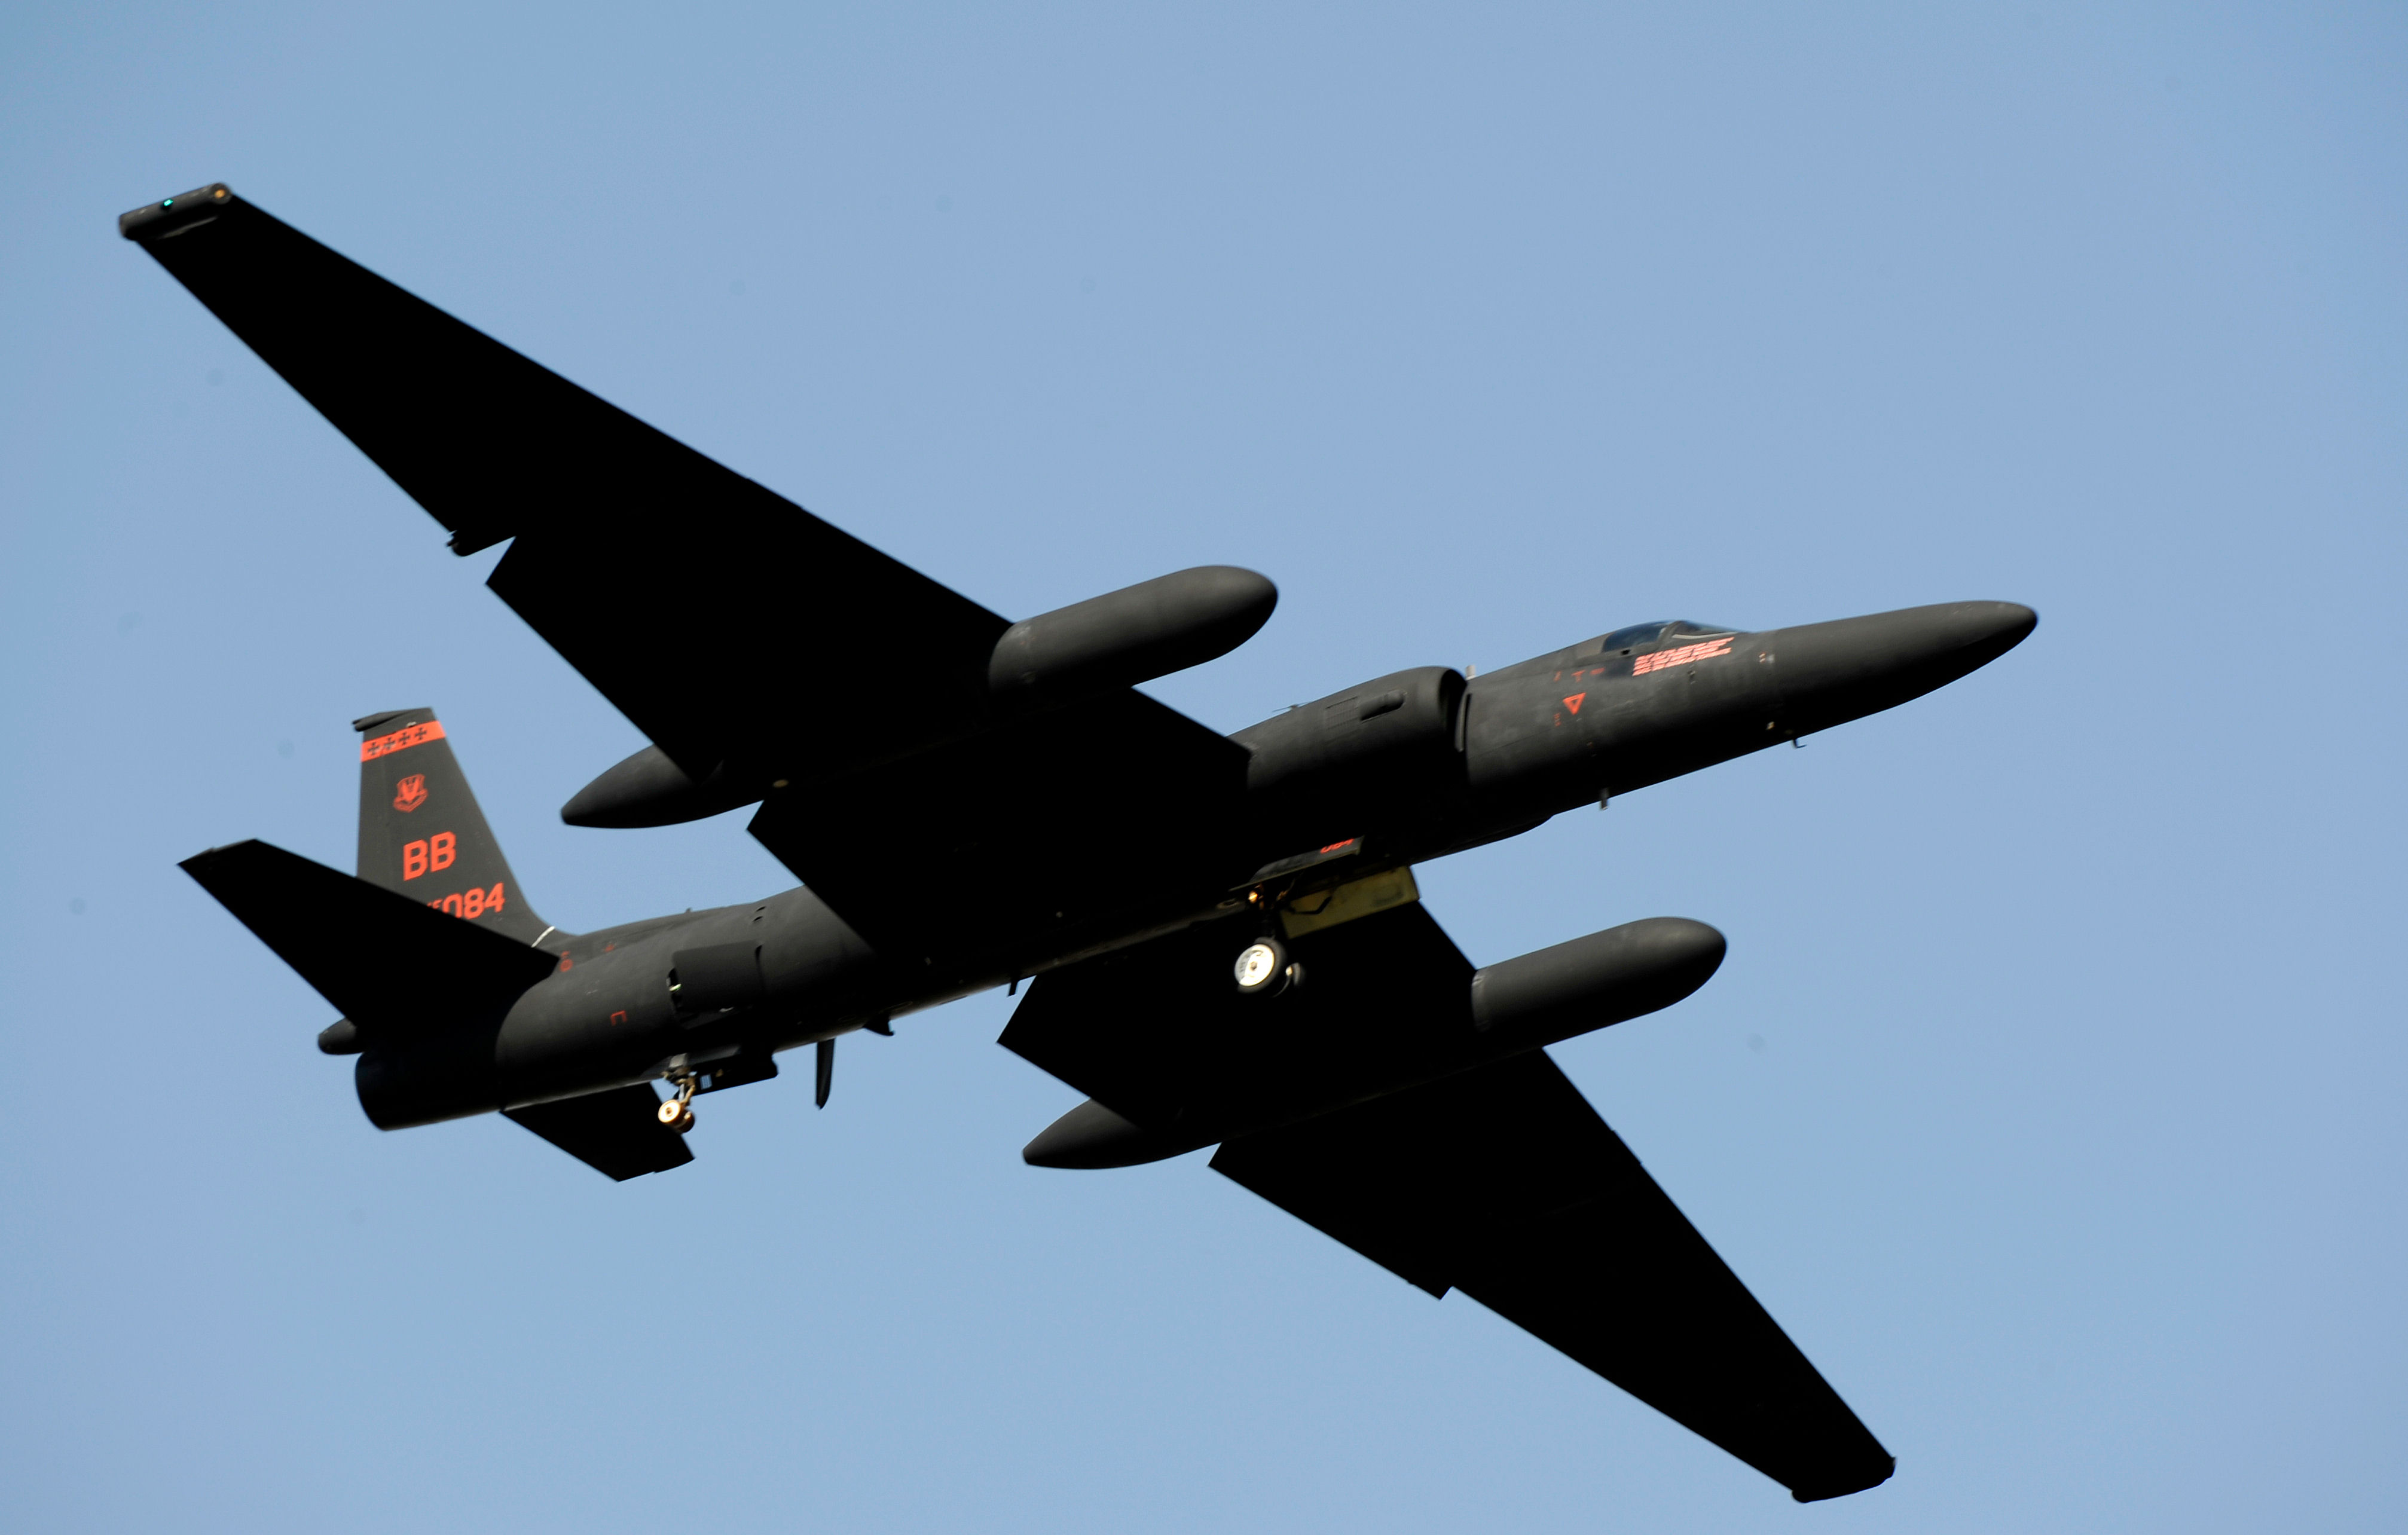 File:5th Reconnaissance Squadron - U-2 Osan.jpg - Wikipedia